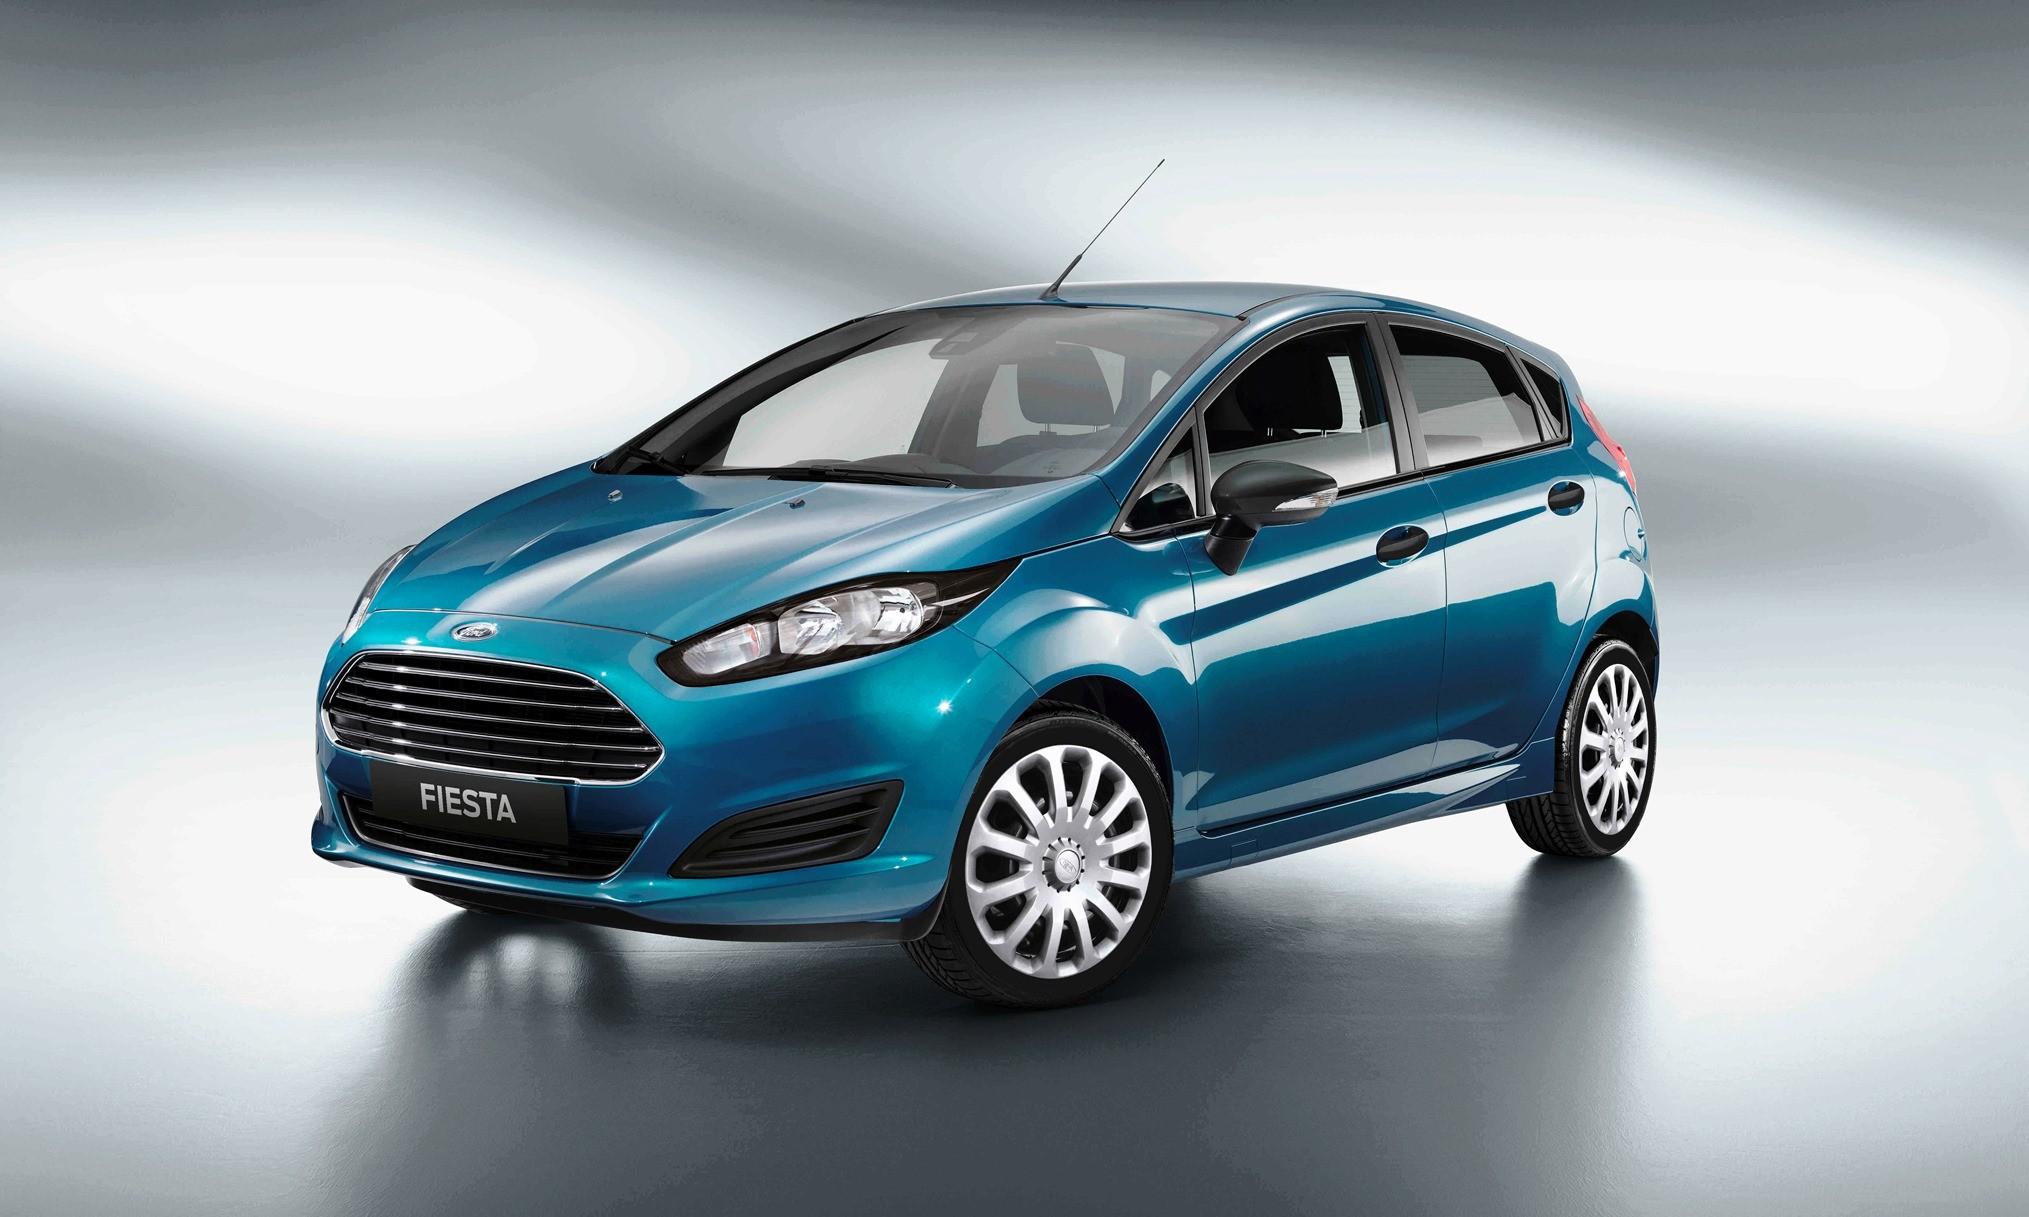 Ford Fiesta 1.0 EcoBoost Trend PowerShift